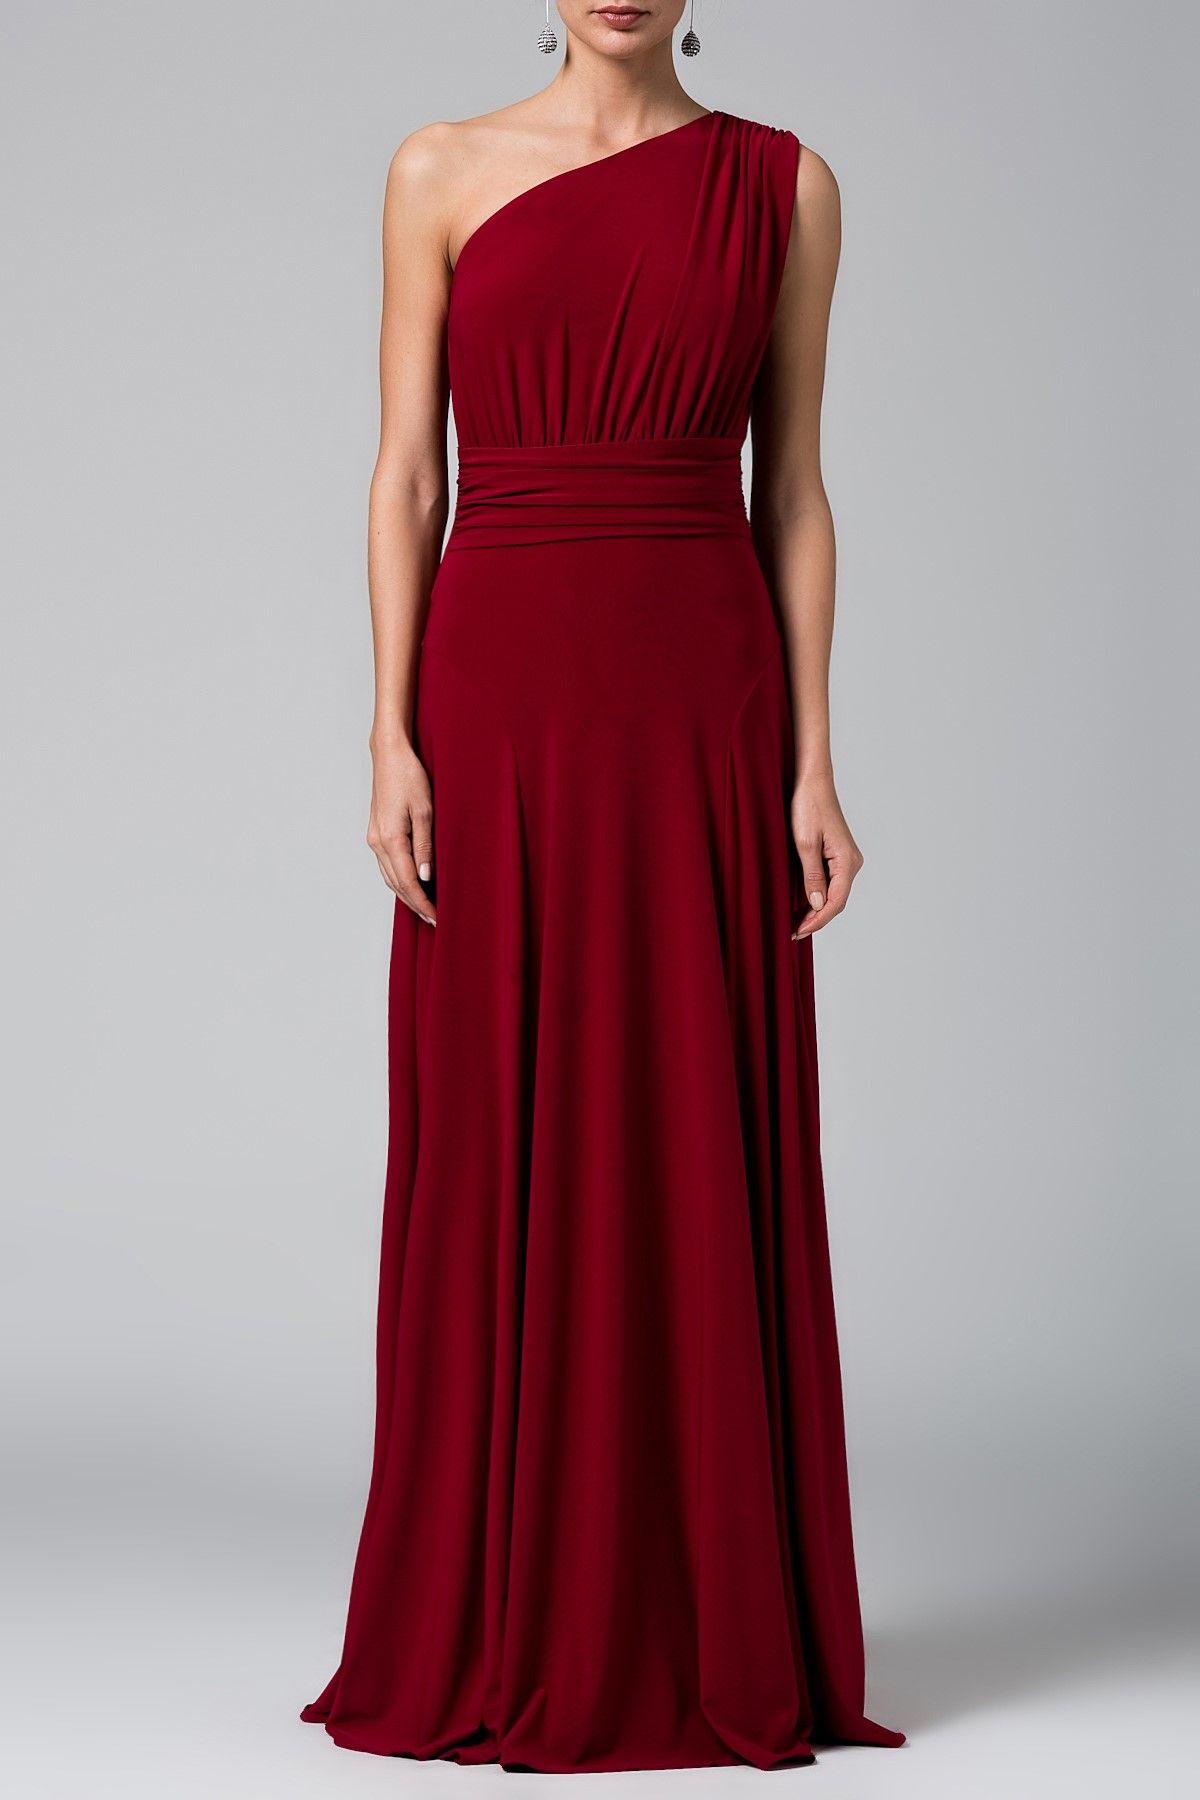 Drapeli Sarap Kirmizi Tek Omuz Abiye Elbise Mlwss16fz0487 Elbise The Dress Elbiseler